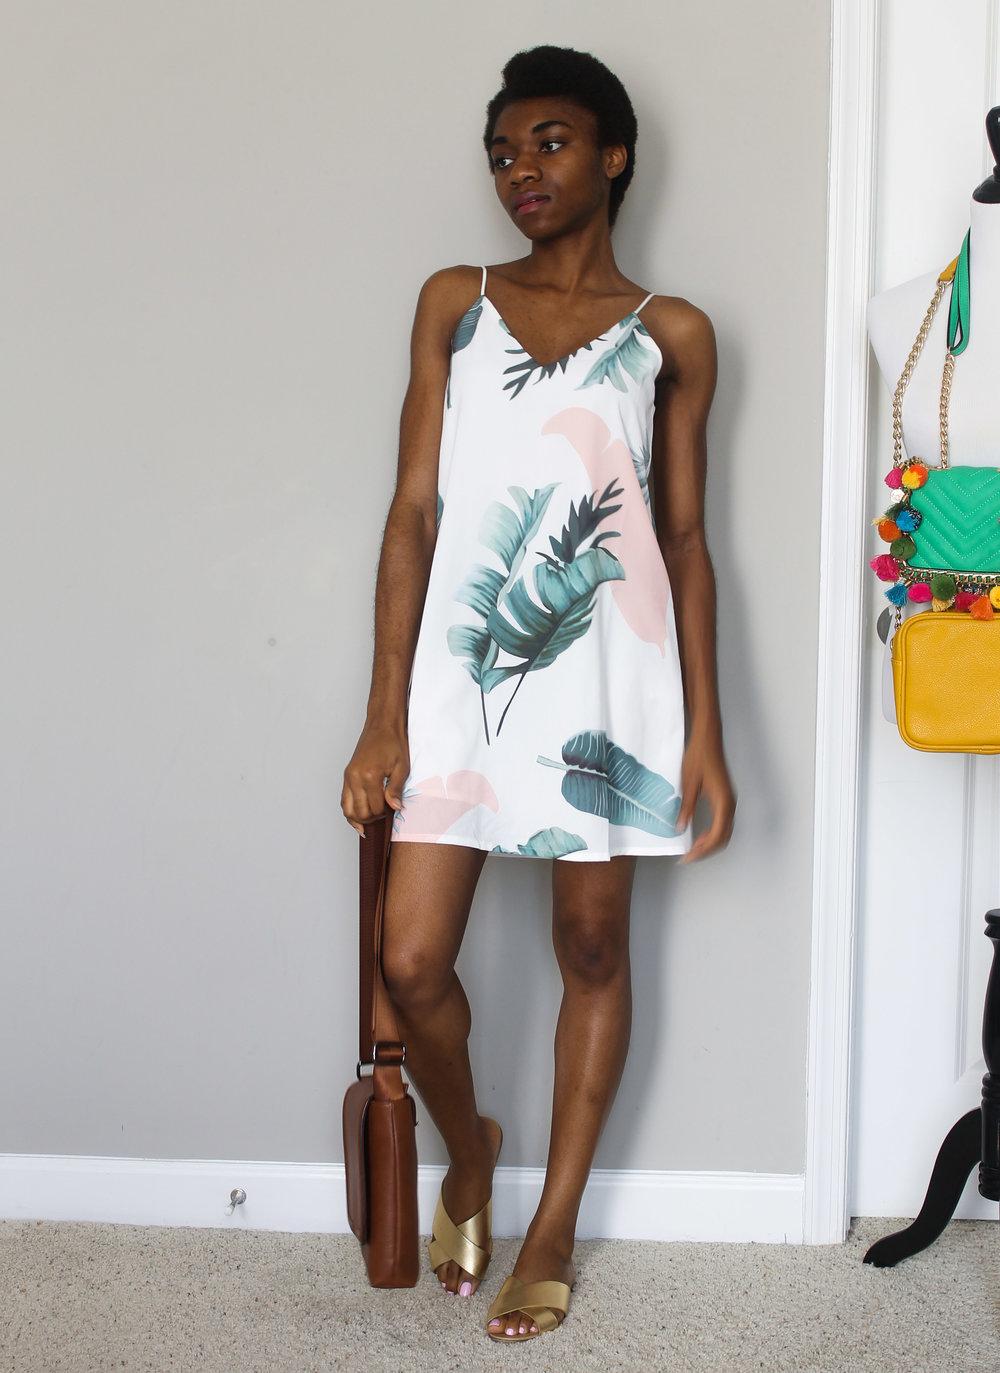 4WaystoWear-tropical-prints-dress 3.jpg